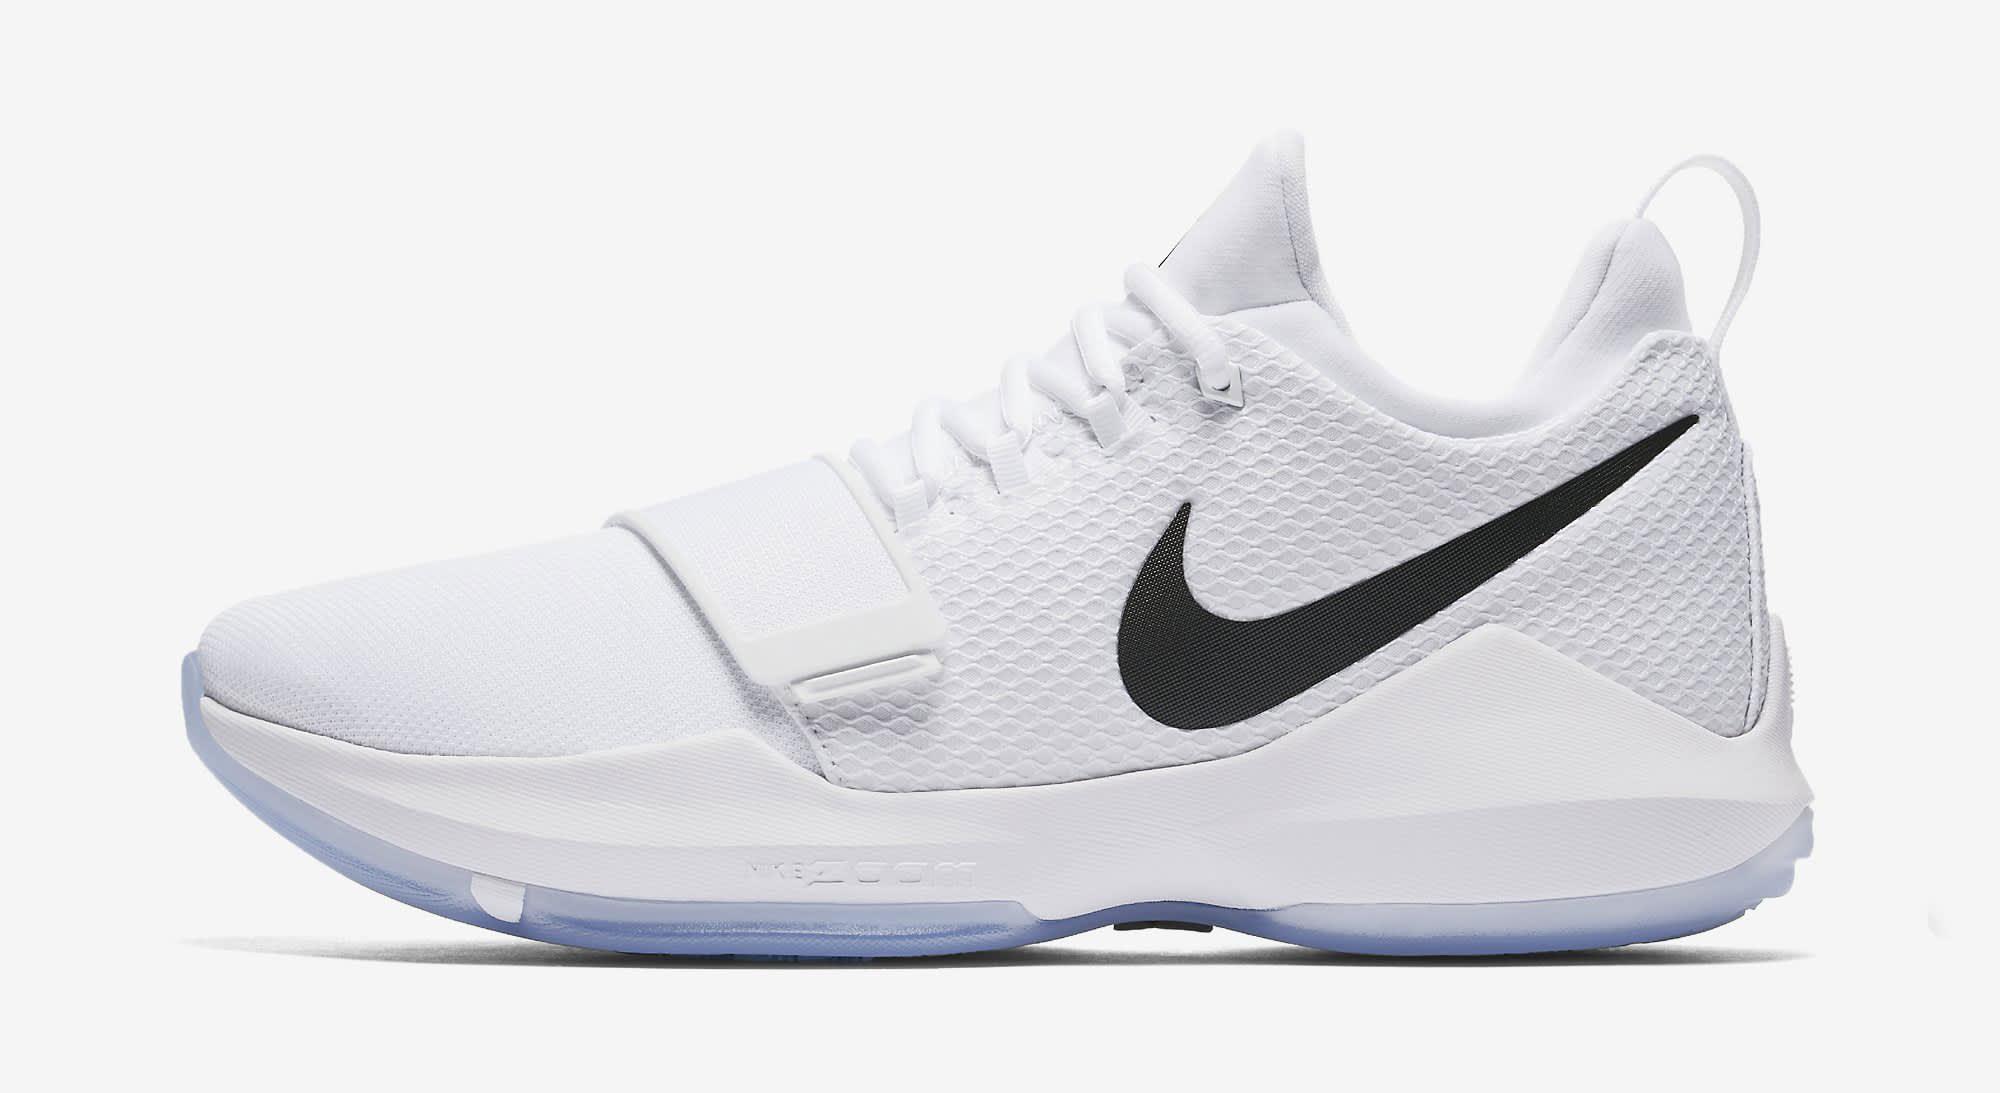 Nike Pg1 White Black Chrome 878627 100 Release Date